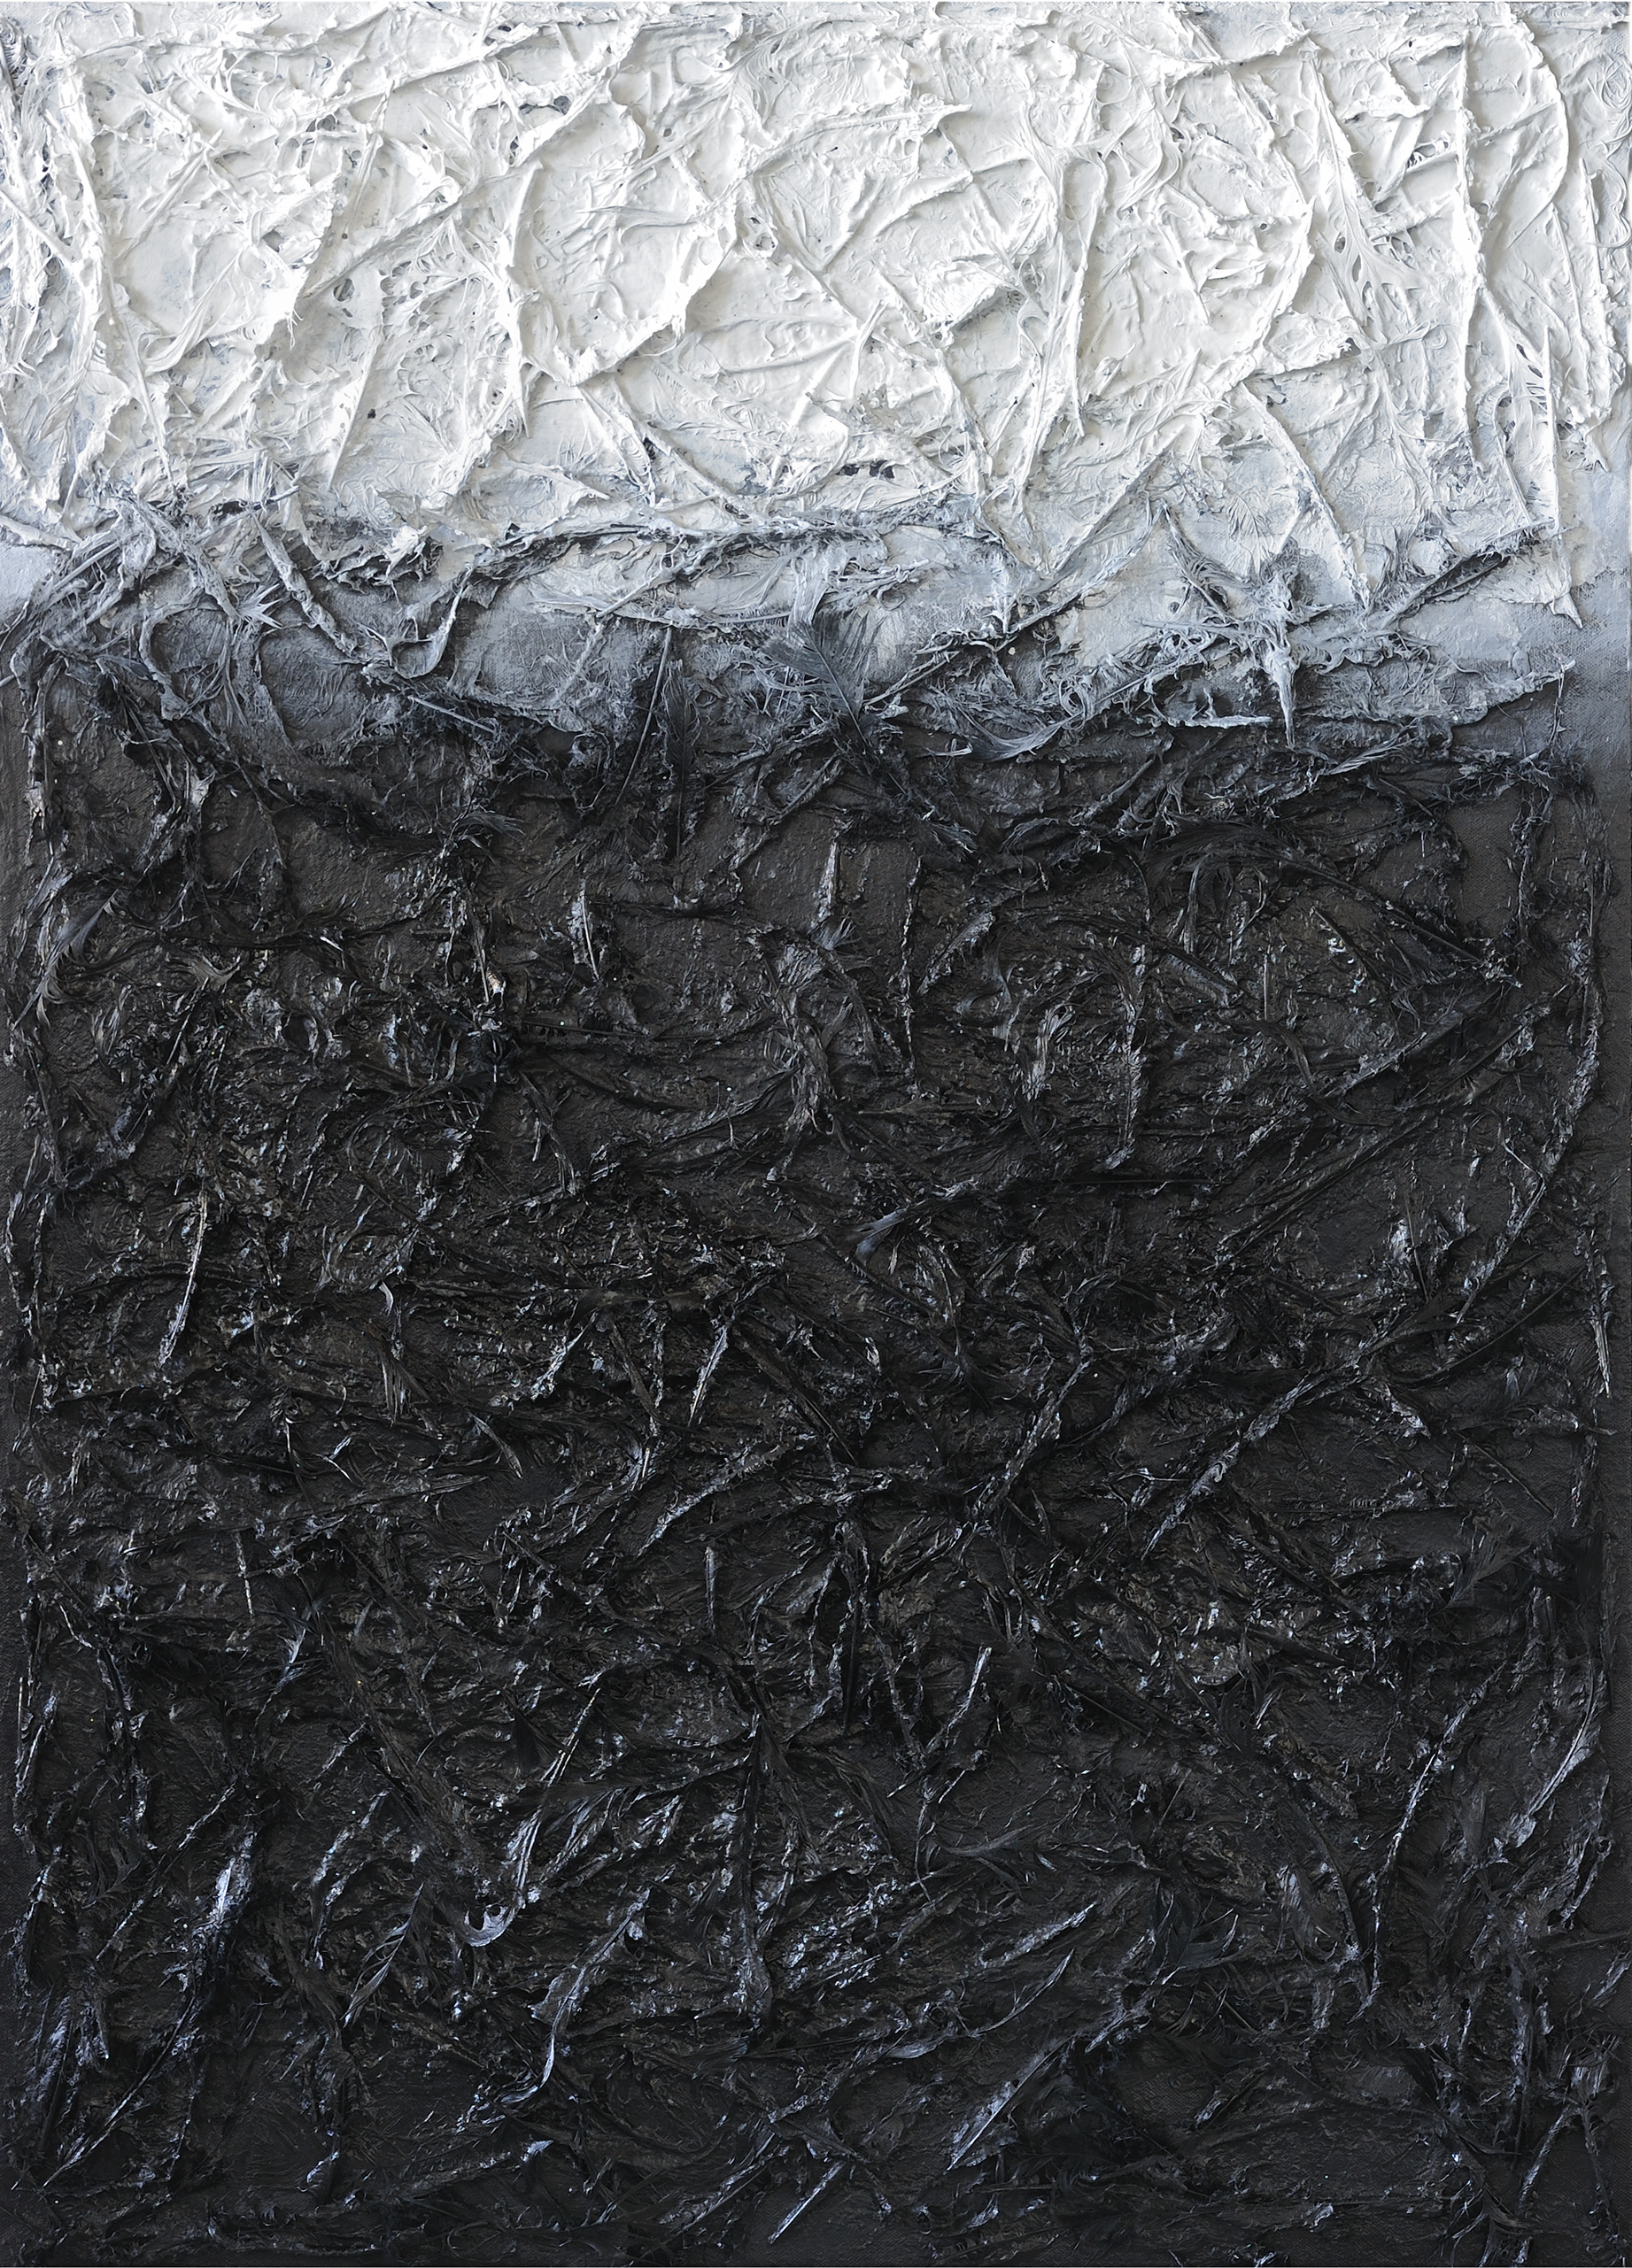 WaysonRJones_Drifting_2017_mixed-media-on-canvas_30x40in_$1800 - Copy.jpg